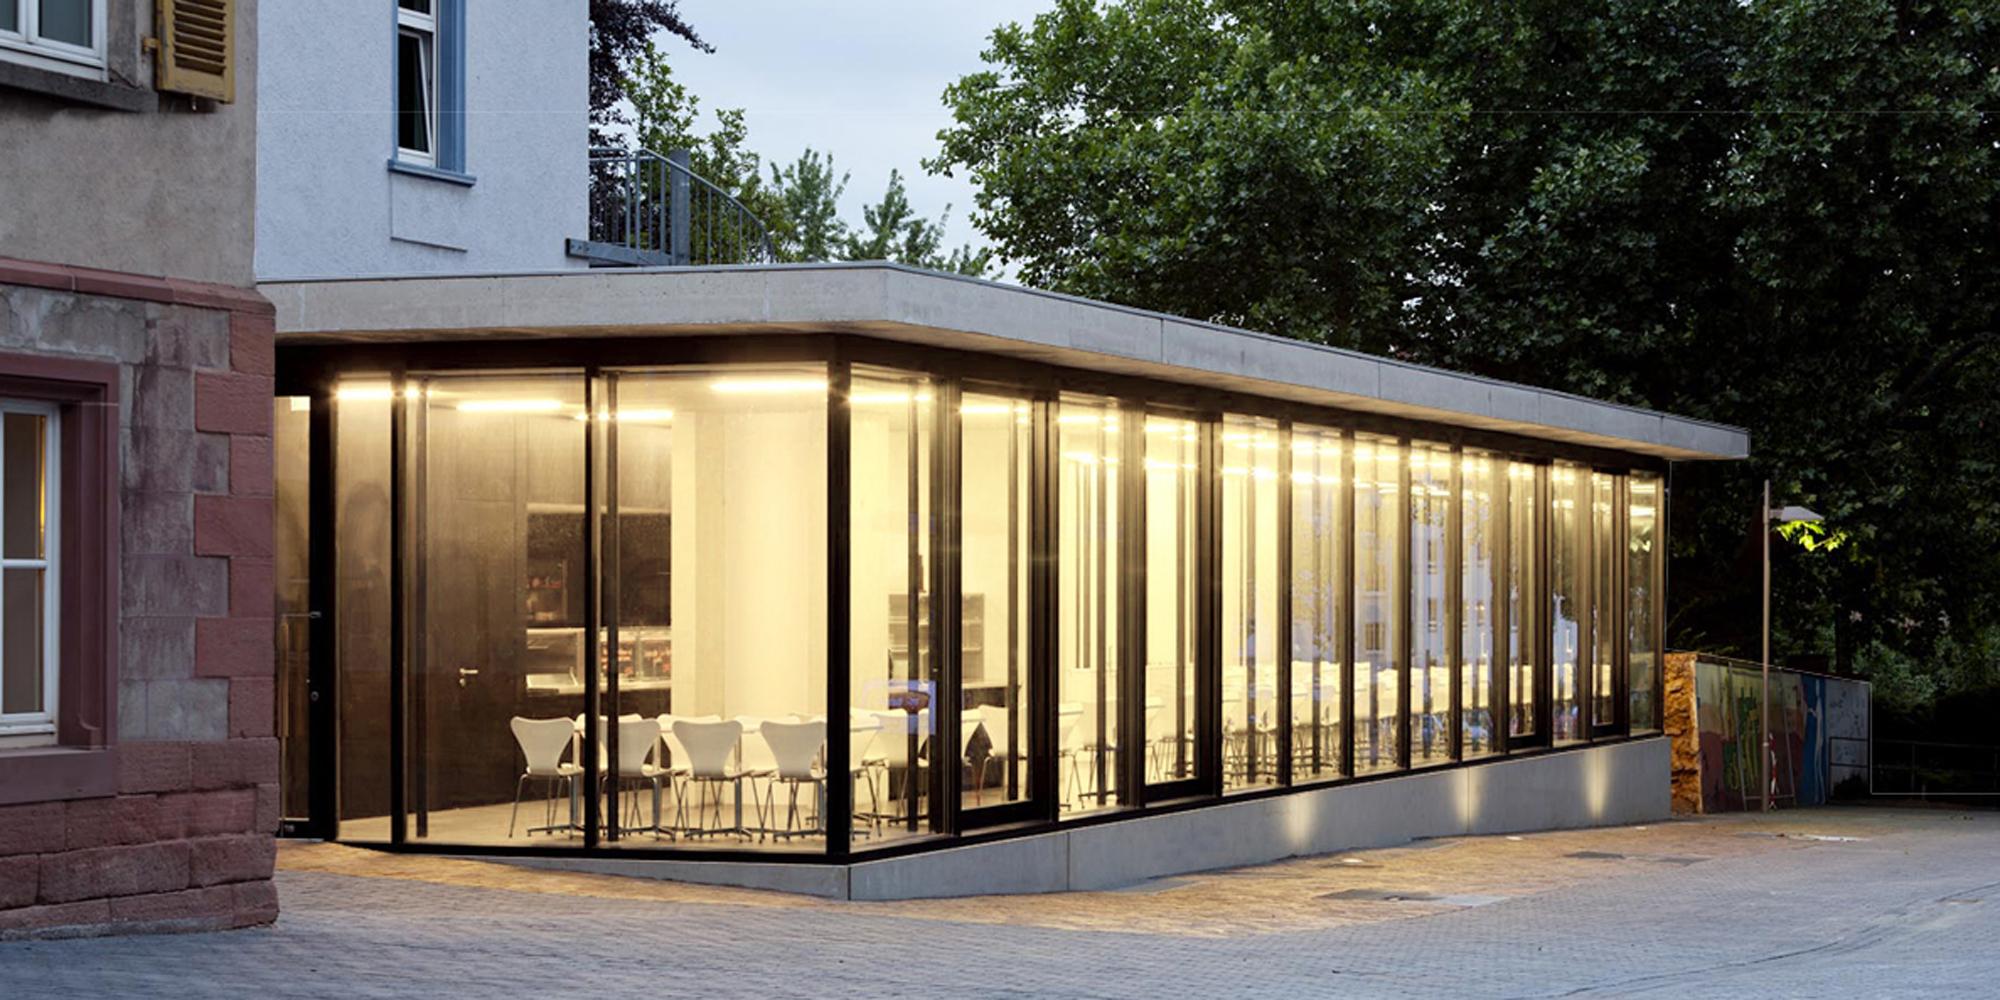 Waechter waechter mensa 2012 waechter waechter architekten bda darmstadt - Wachter wachter architekten ...